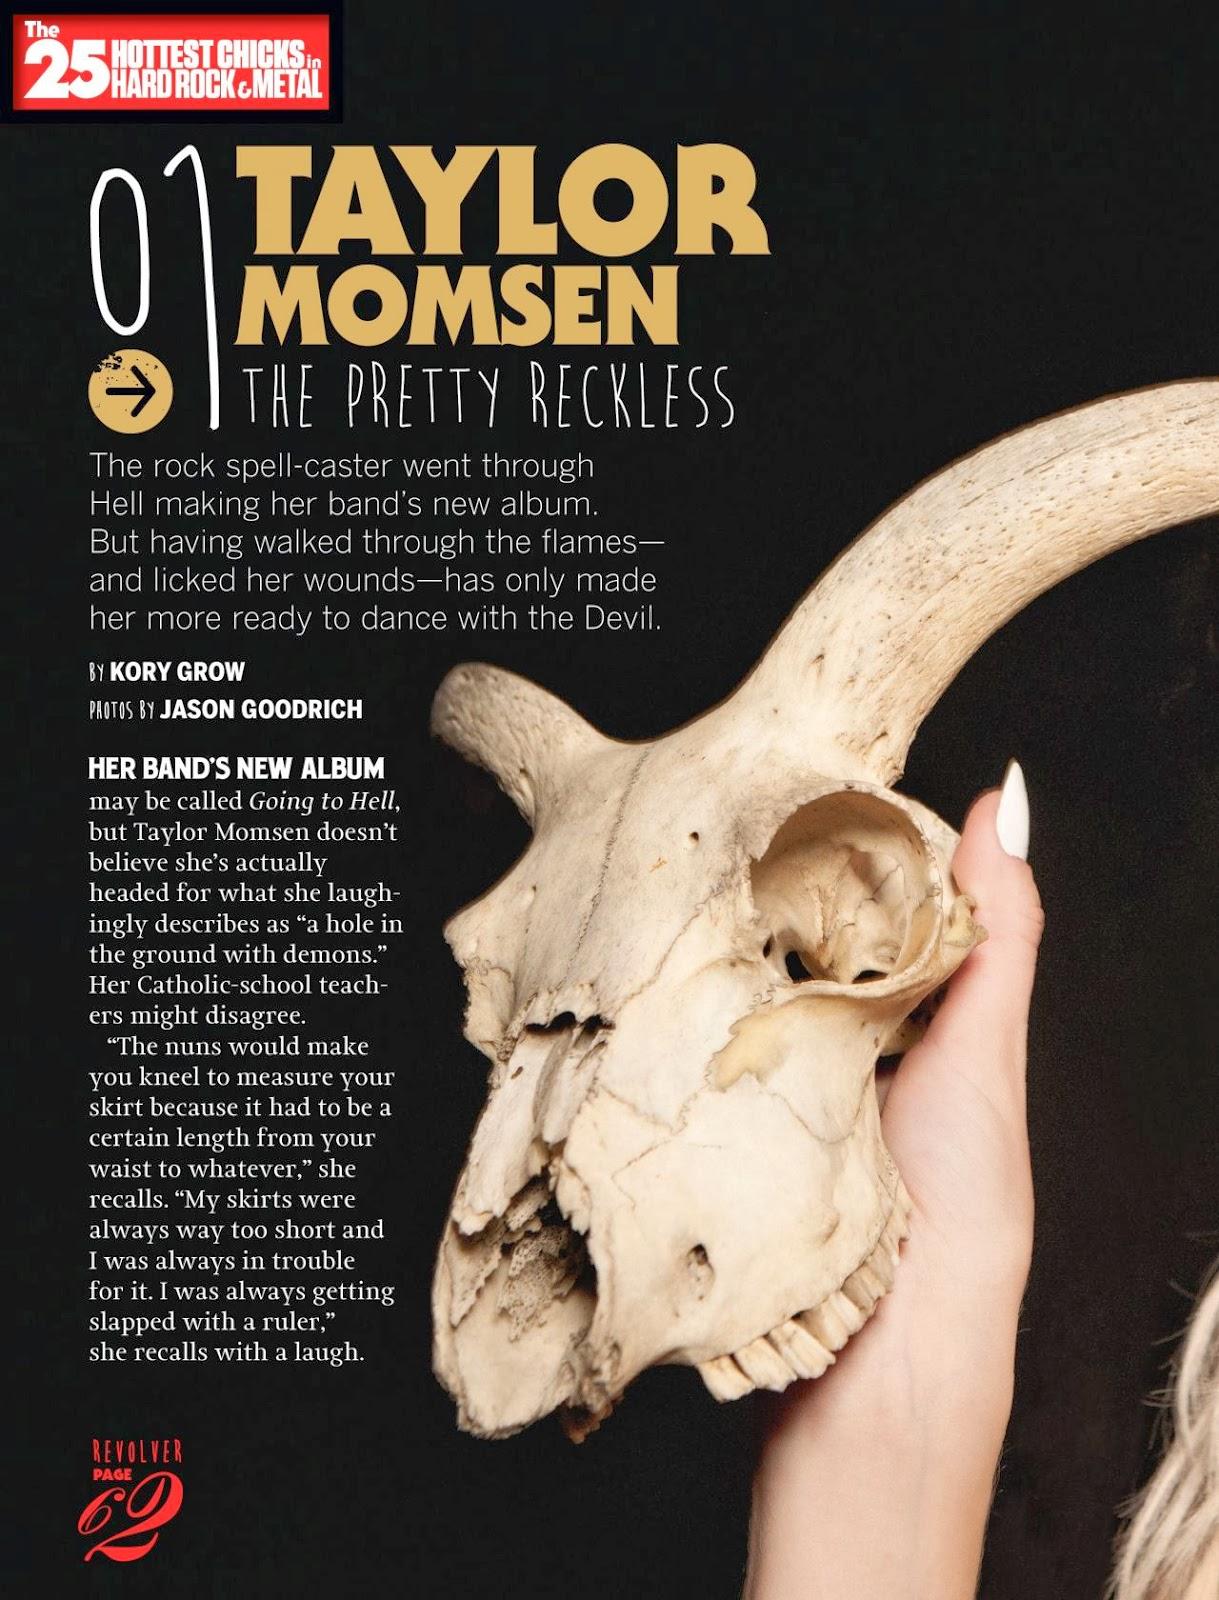 Magazine Photoshoot : Taylor Momsen Photoshot For Revolver Magazine February/March 2014 Issue